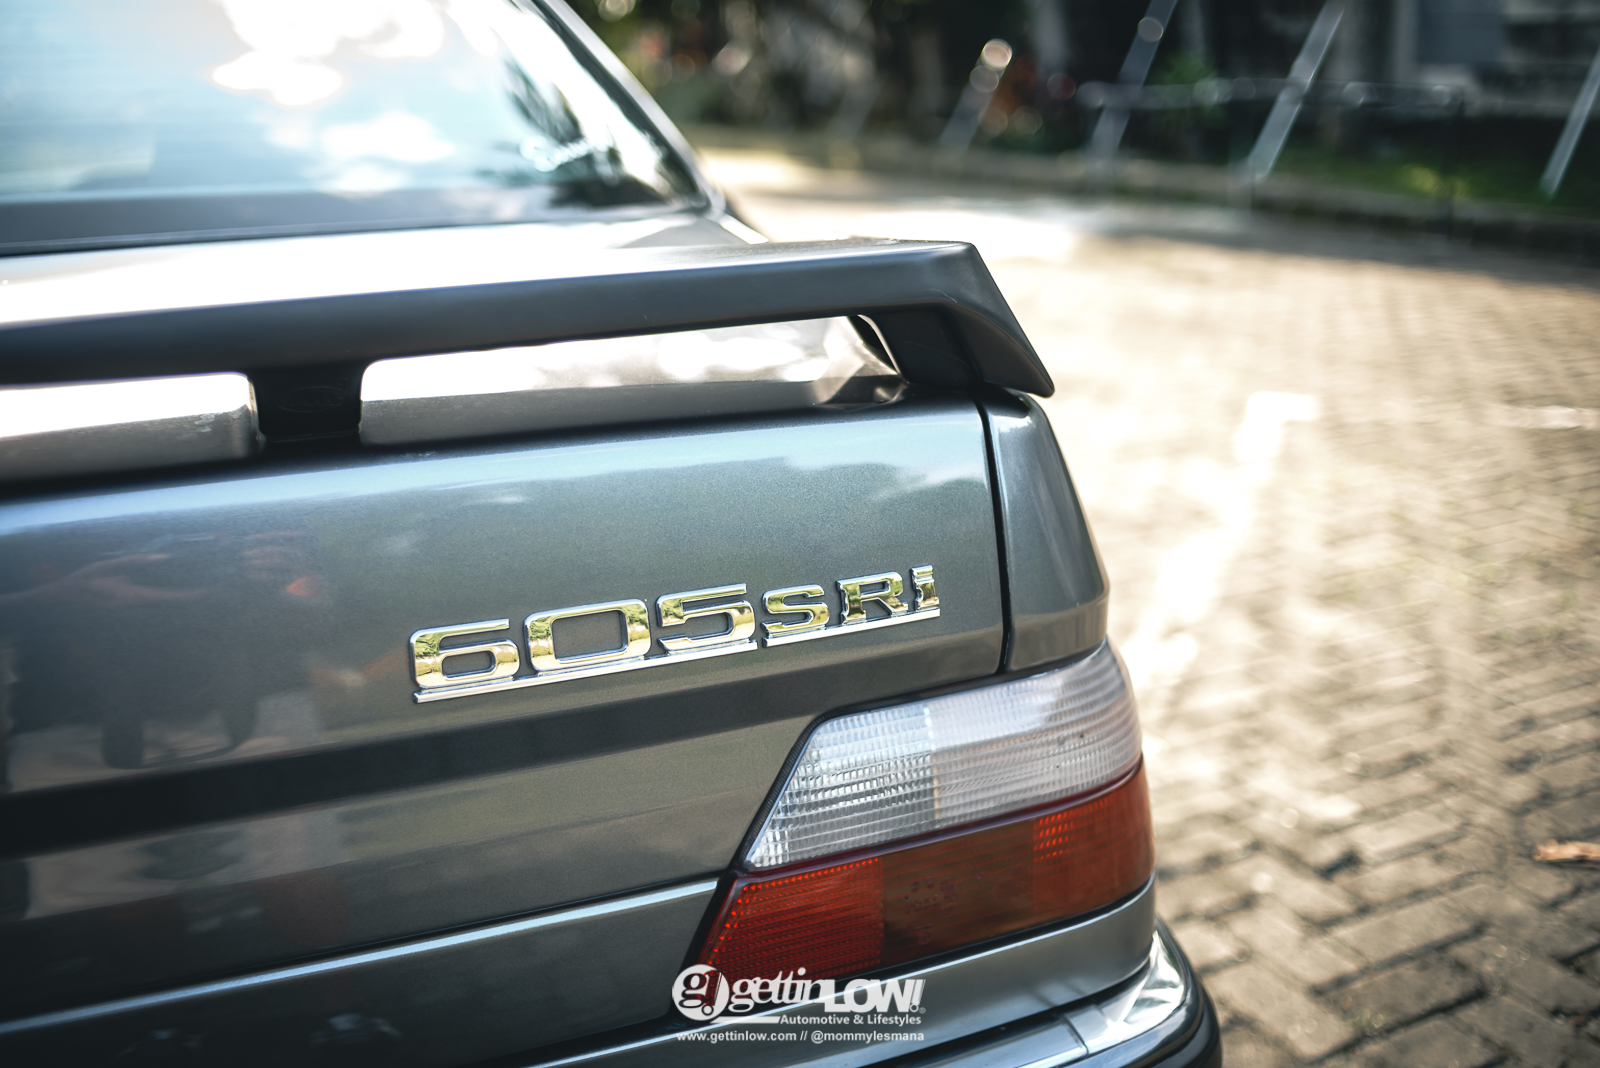 PEUGEOT 605 SRi